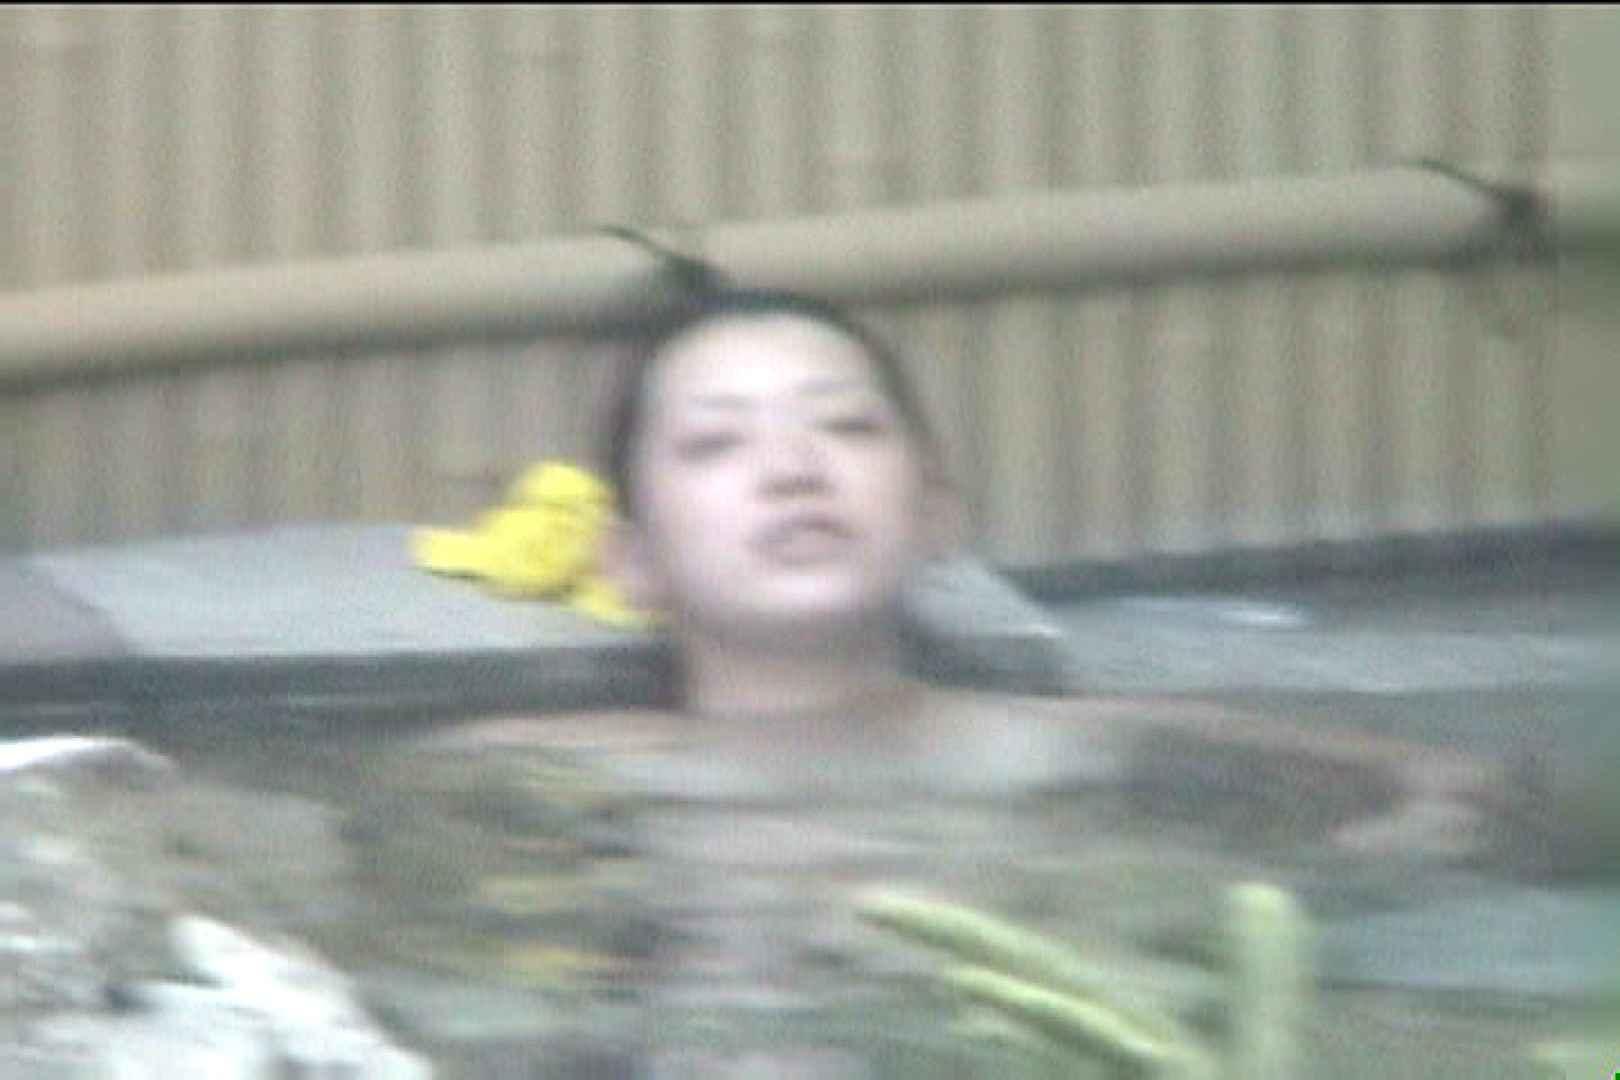 Aquaな露天風呂Vol.102 露天風呂編  90PIX 40